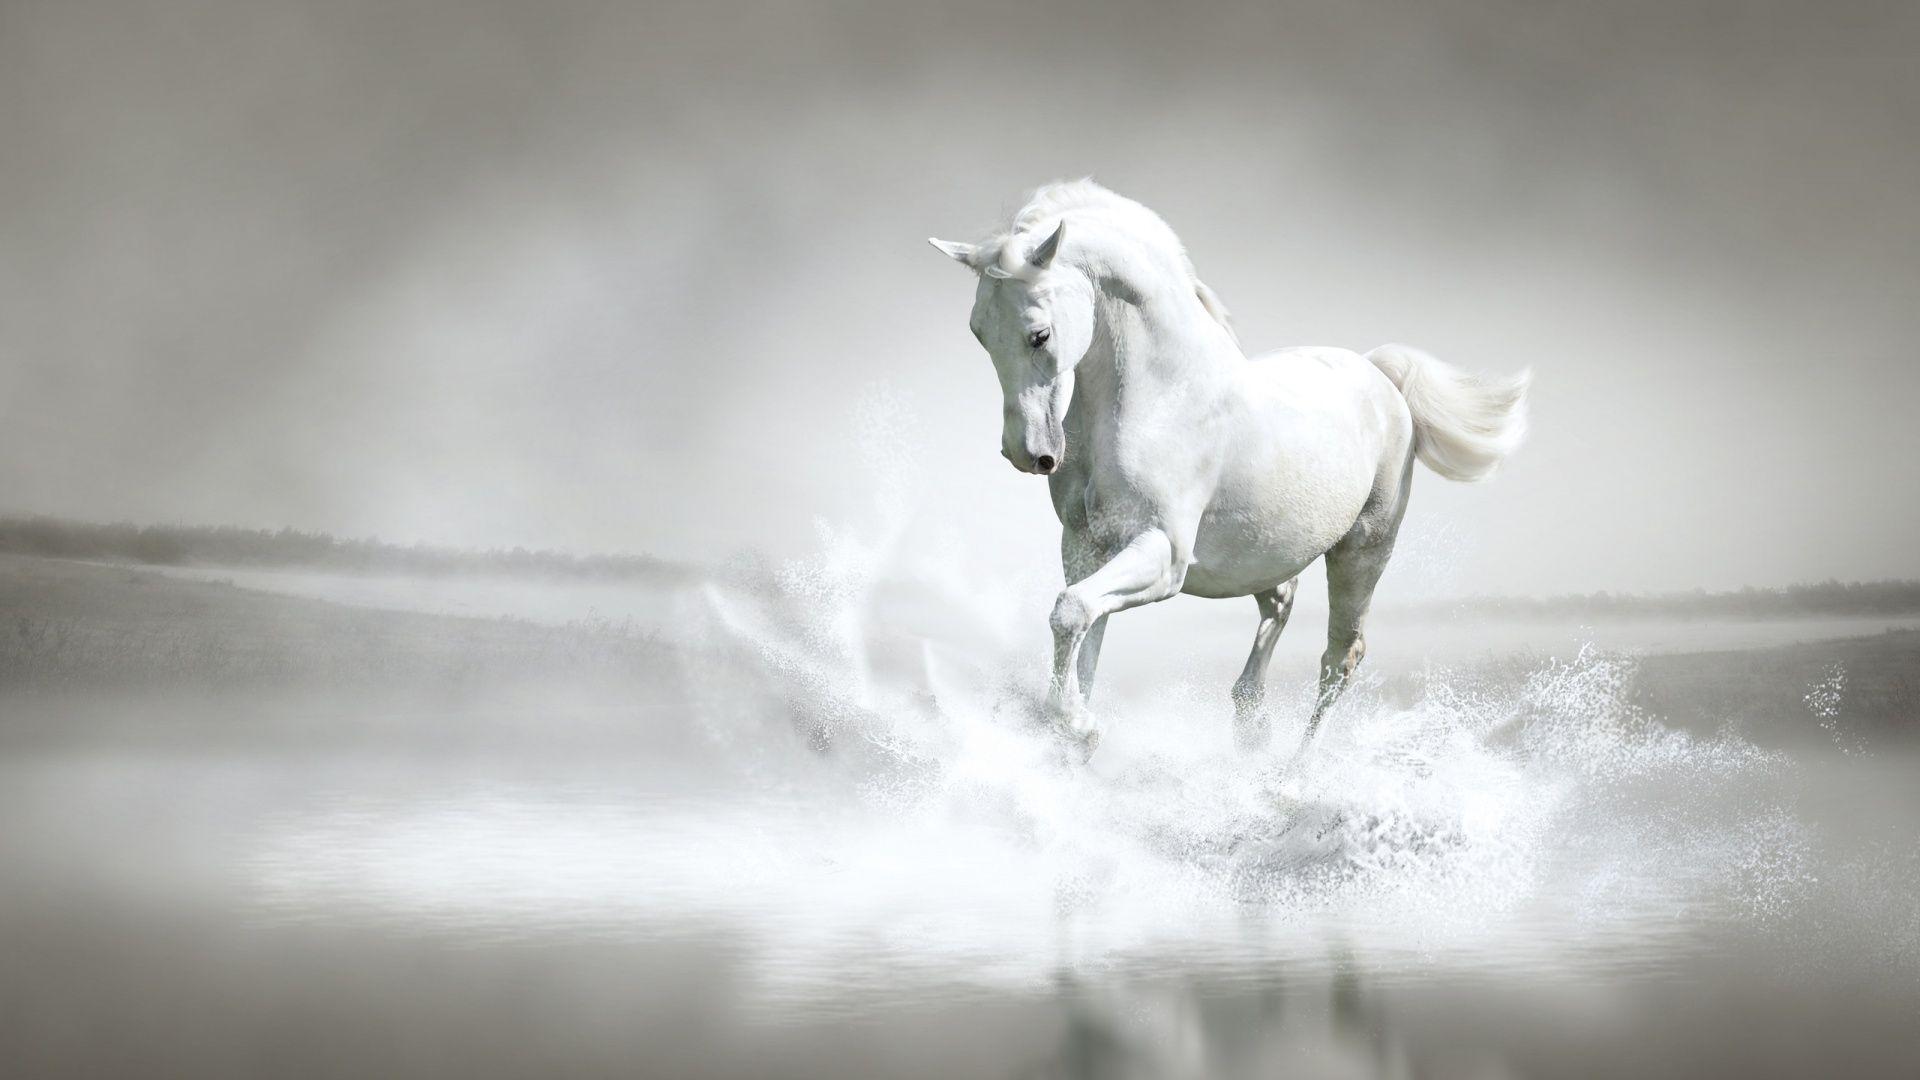 White Horse [1920 x 1080] Need iPhone 6S Plus Wallpaper